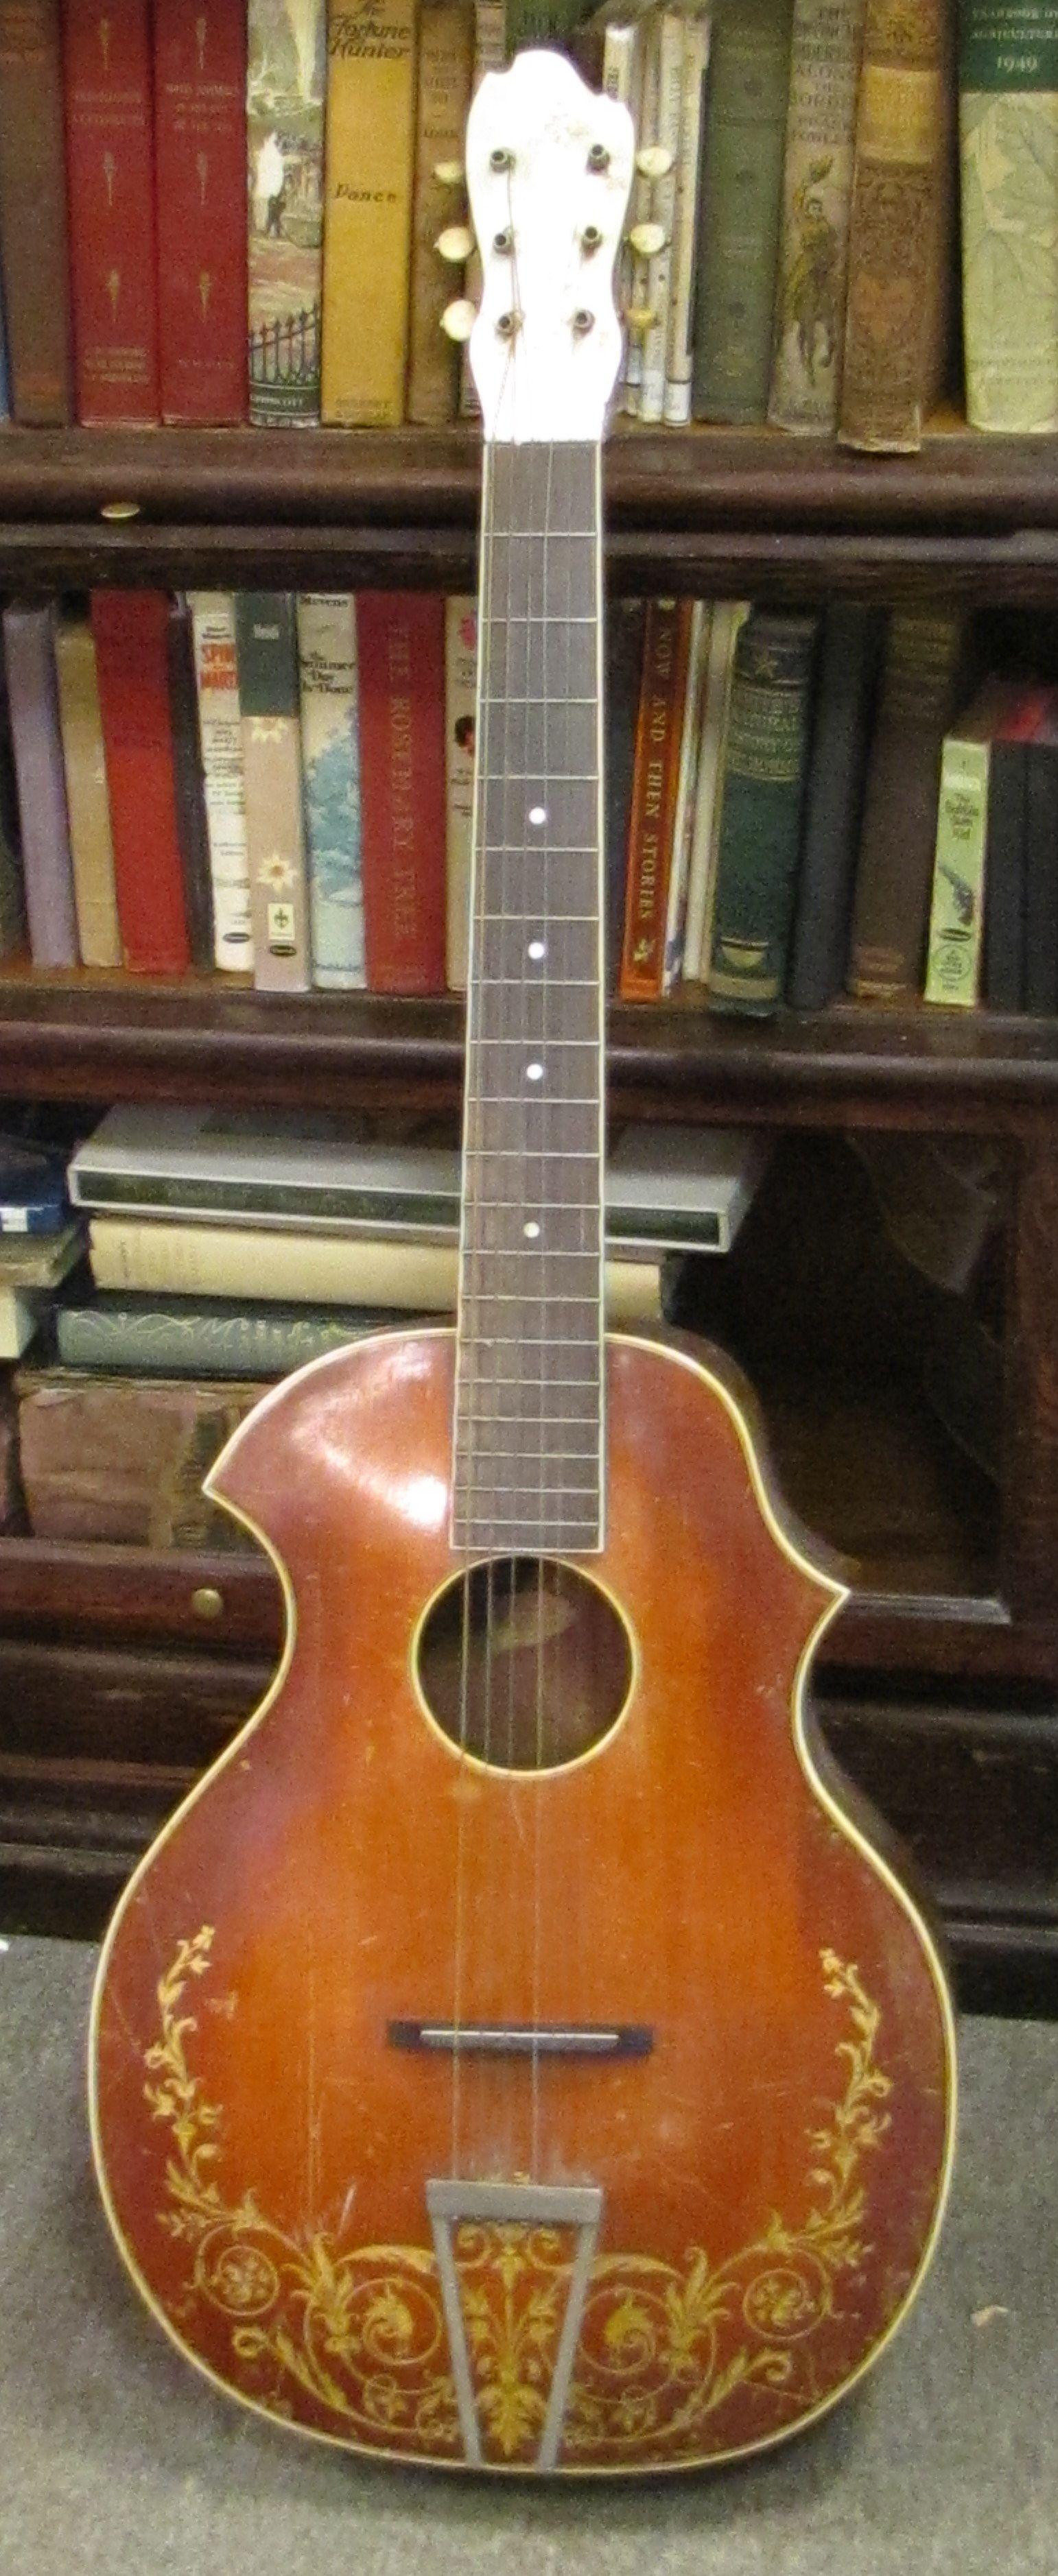 1920's Kay Recording King blues guitar with Venetian